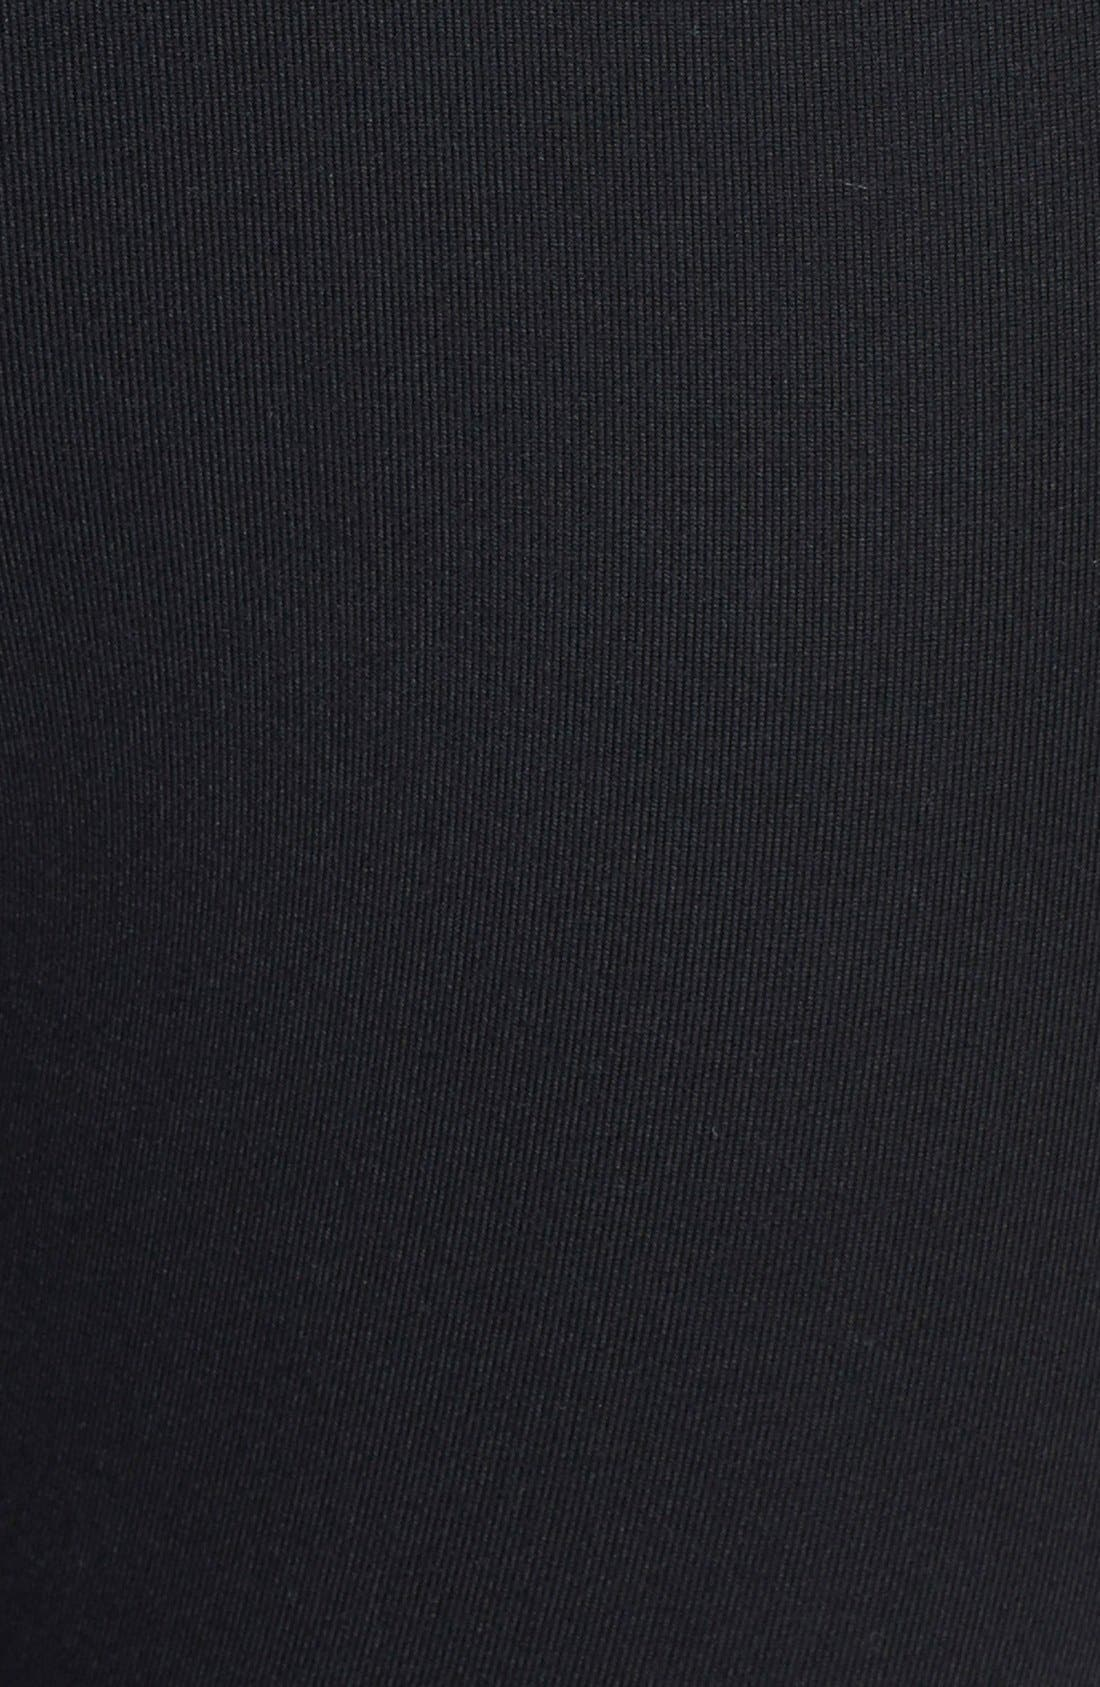 Alternate Image 4  - Nike 'Epic Run' Dri-FIT Crop Tights